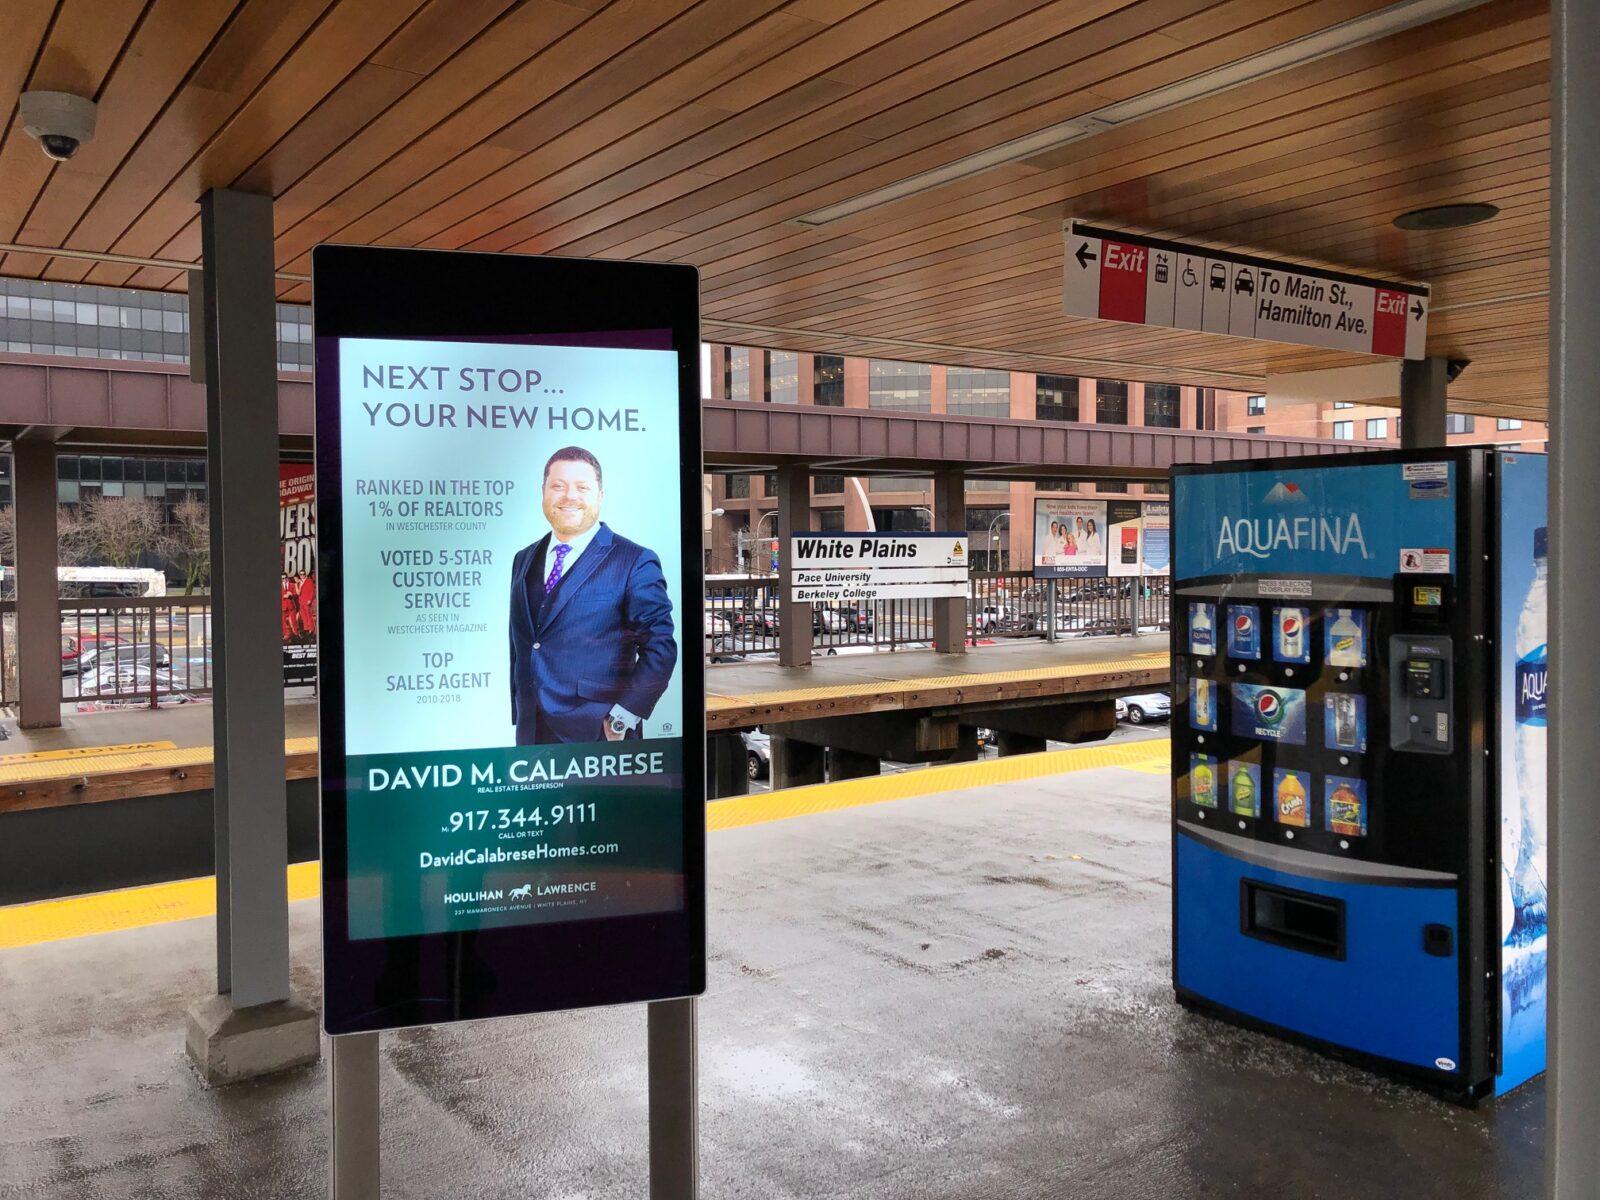 Houlihan Lawrence Digital Rail Platform Advertising Campaign